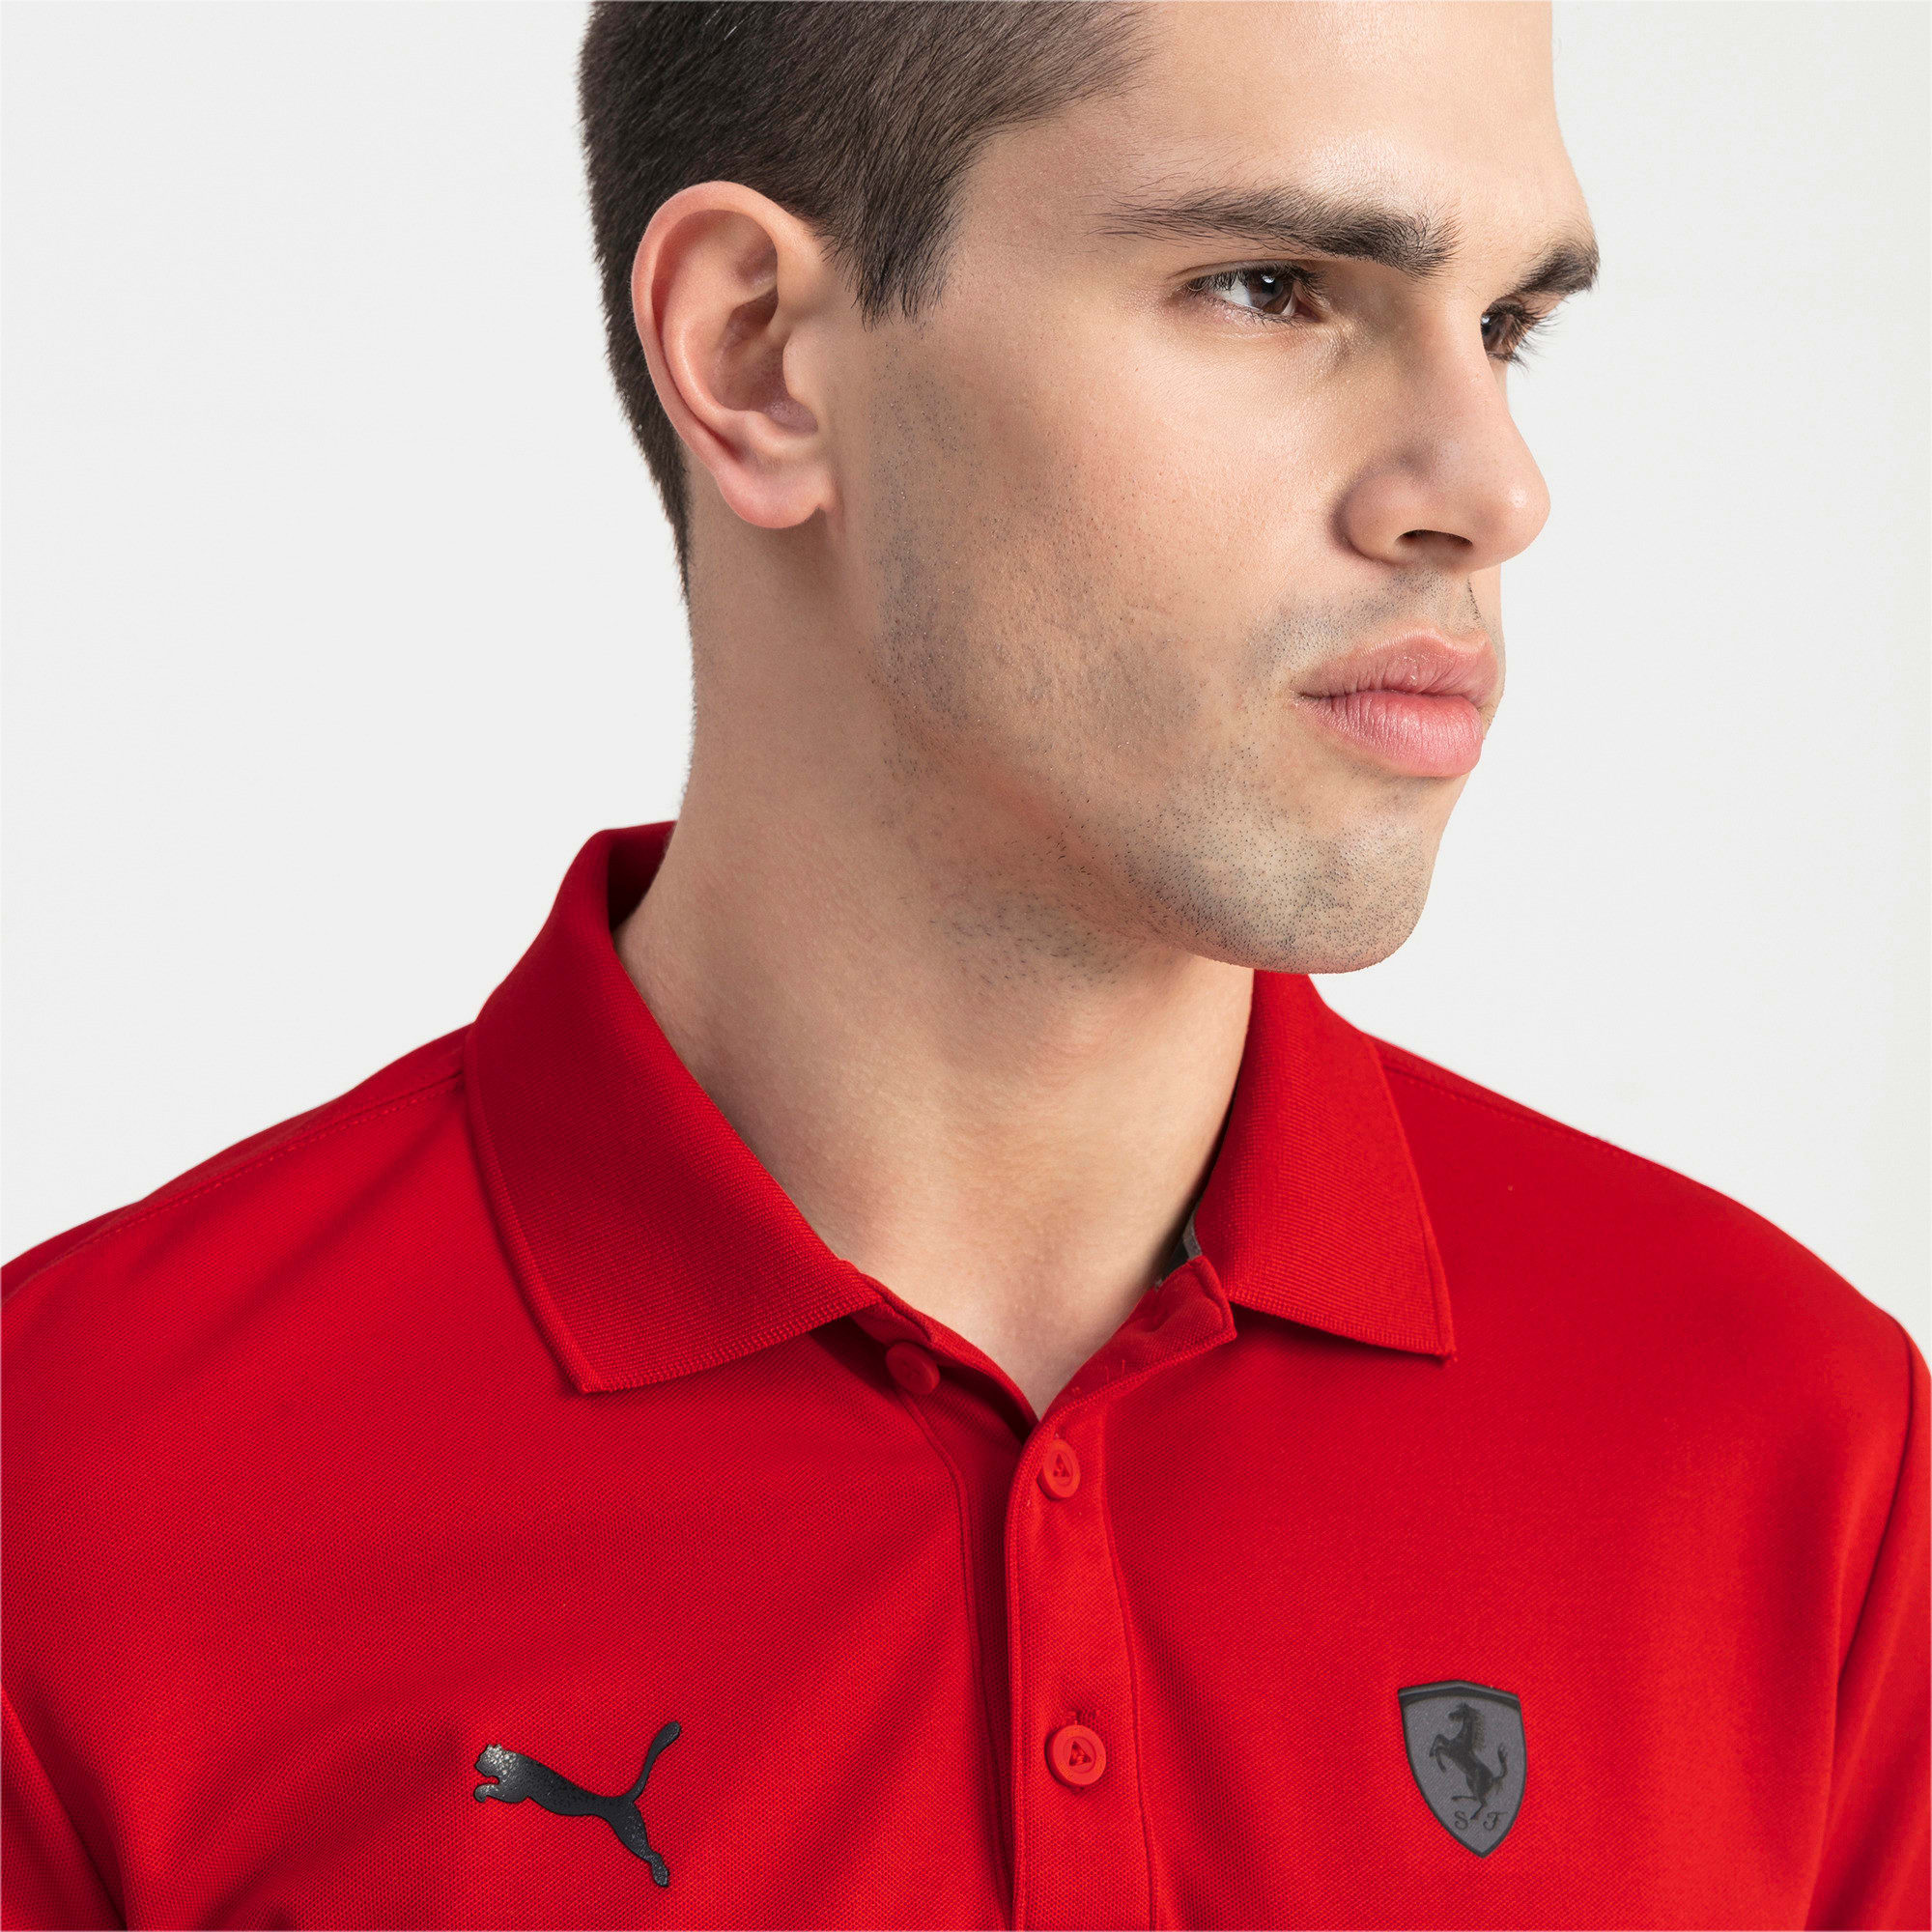 Thumbnail 4 of Ferrari Men's Polo Shirt, Rosso Corsa, medium